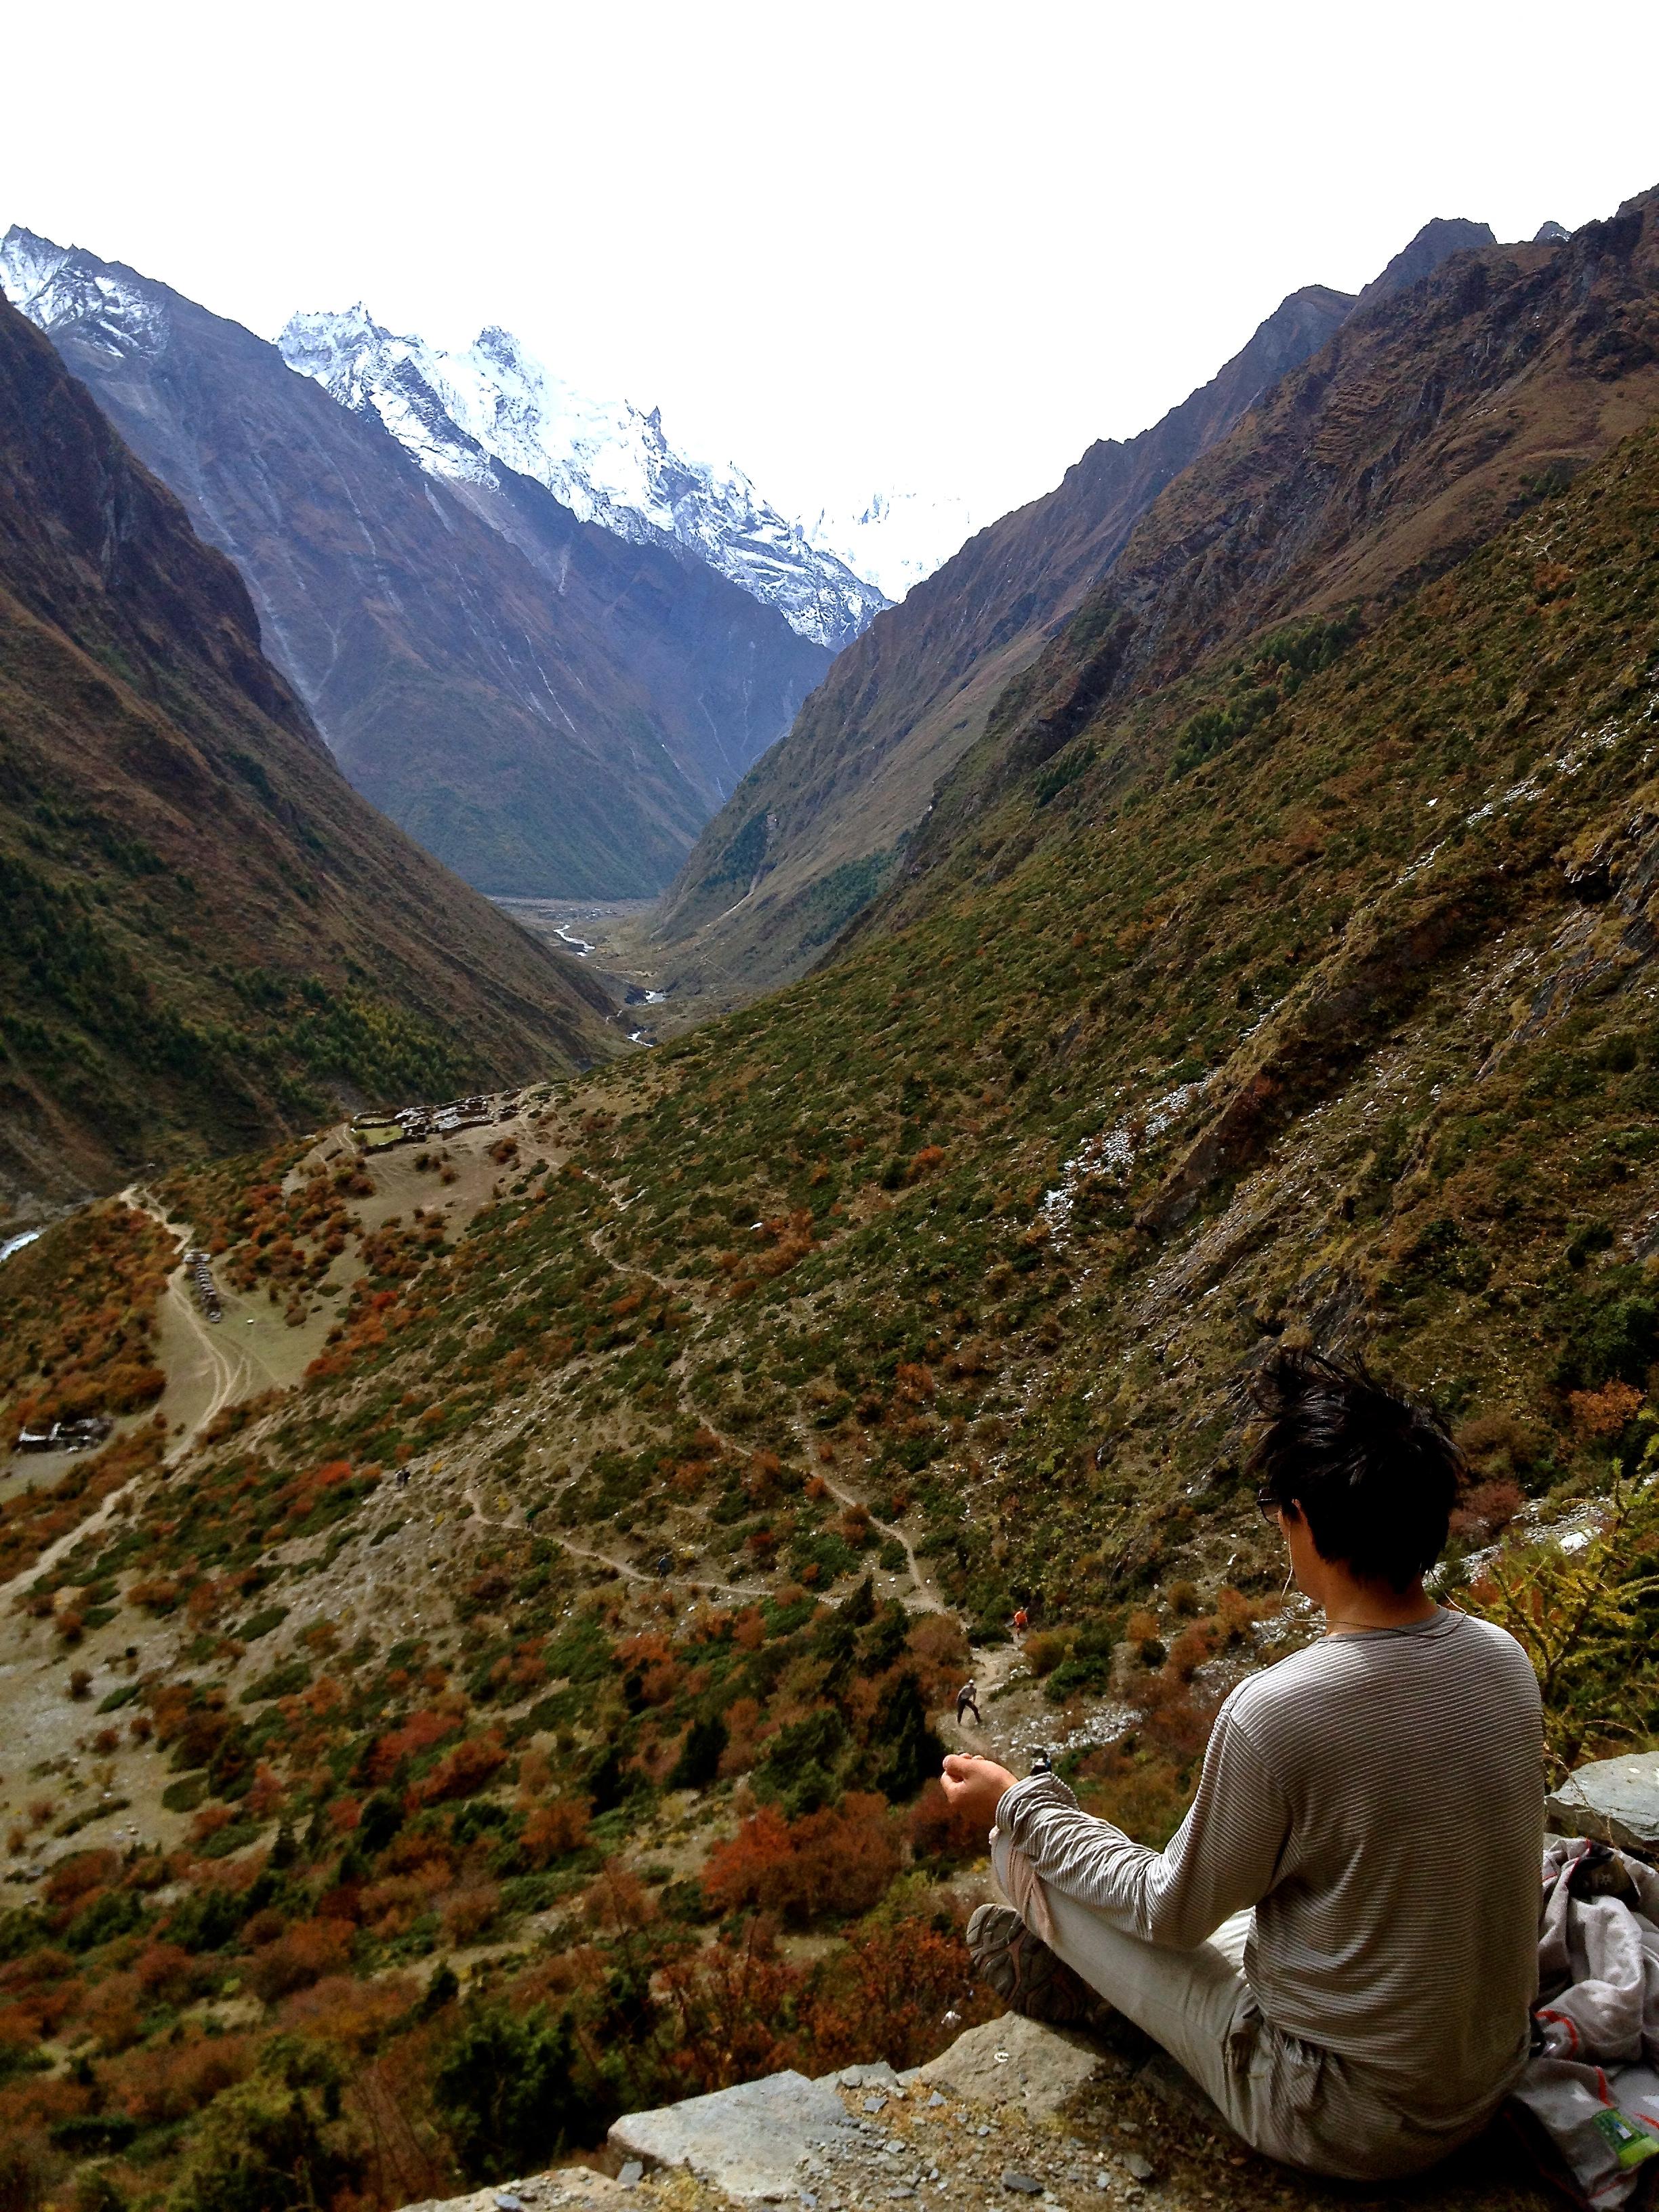 the way to rainy mountain essay engl a composition i sjsu course hero yamwl